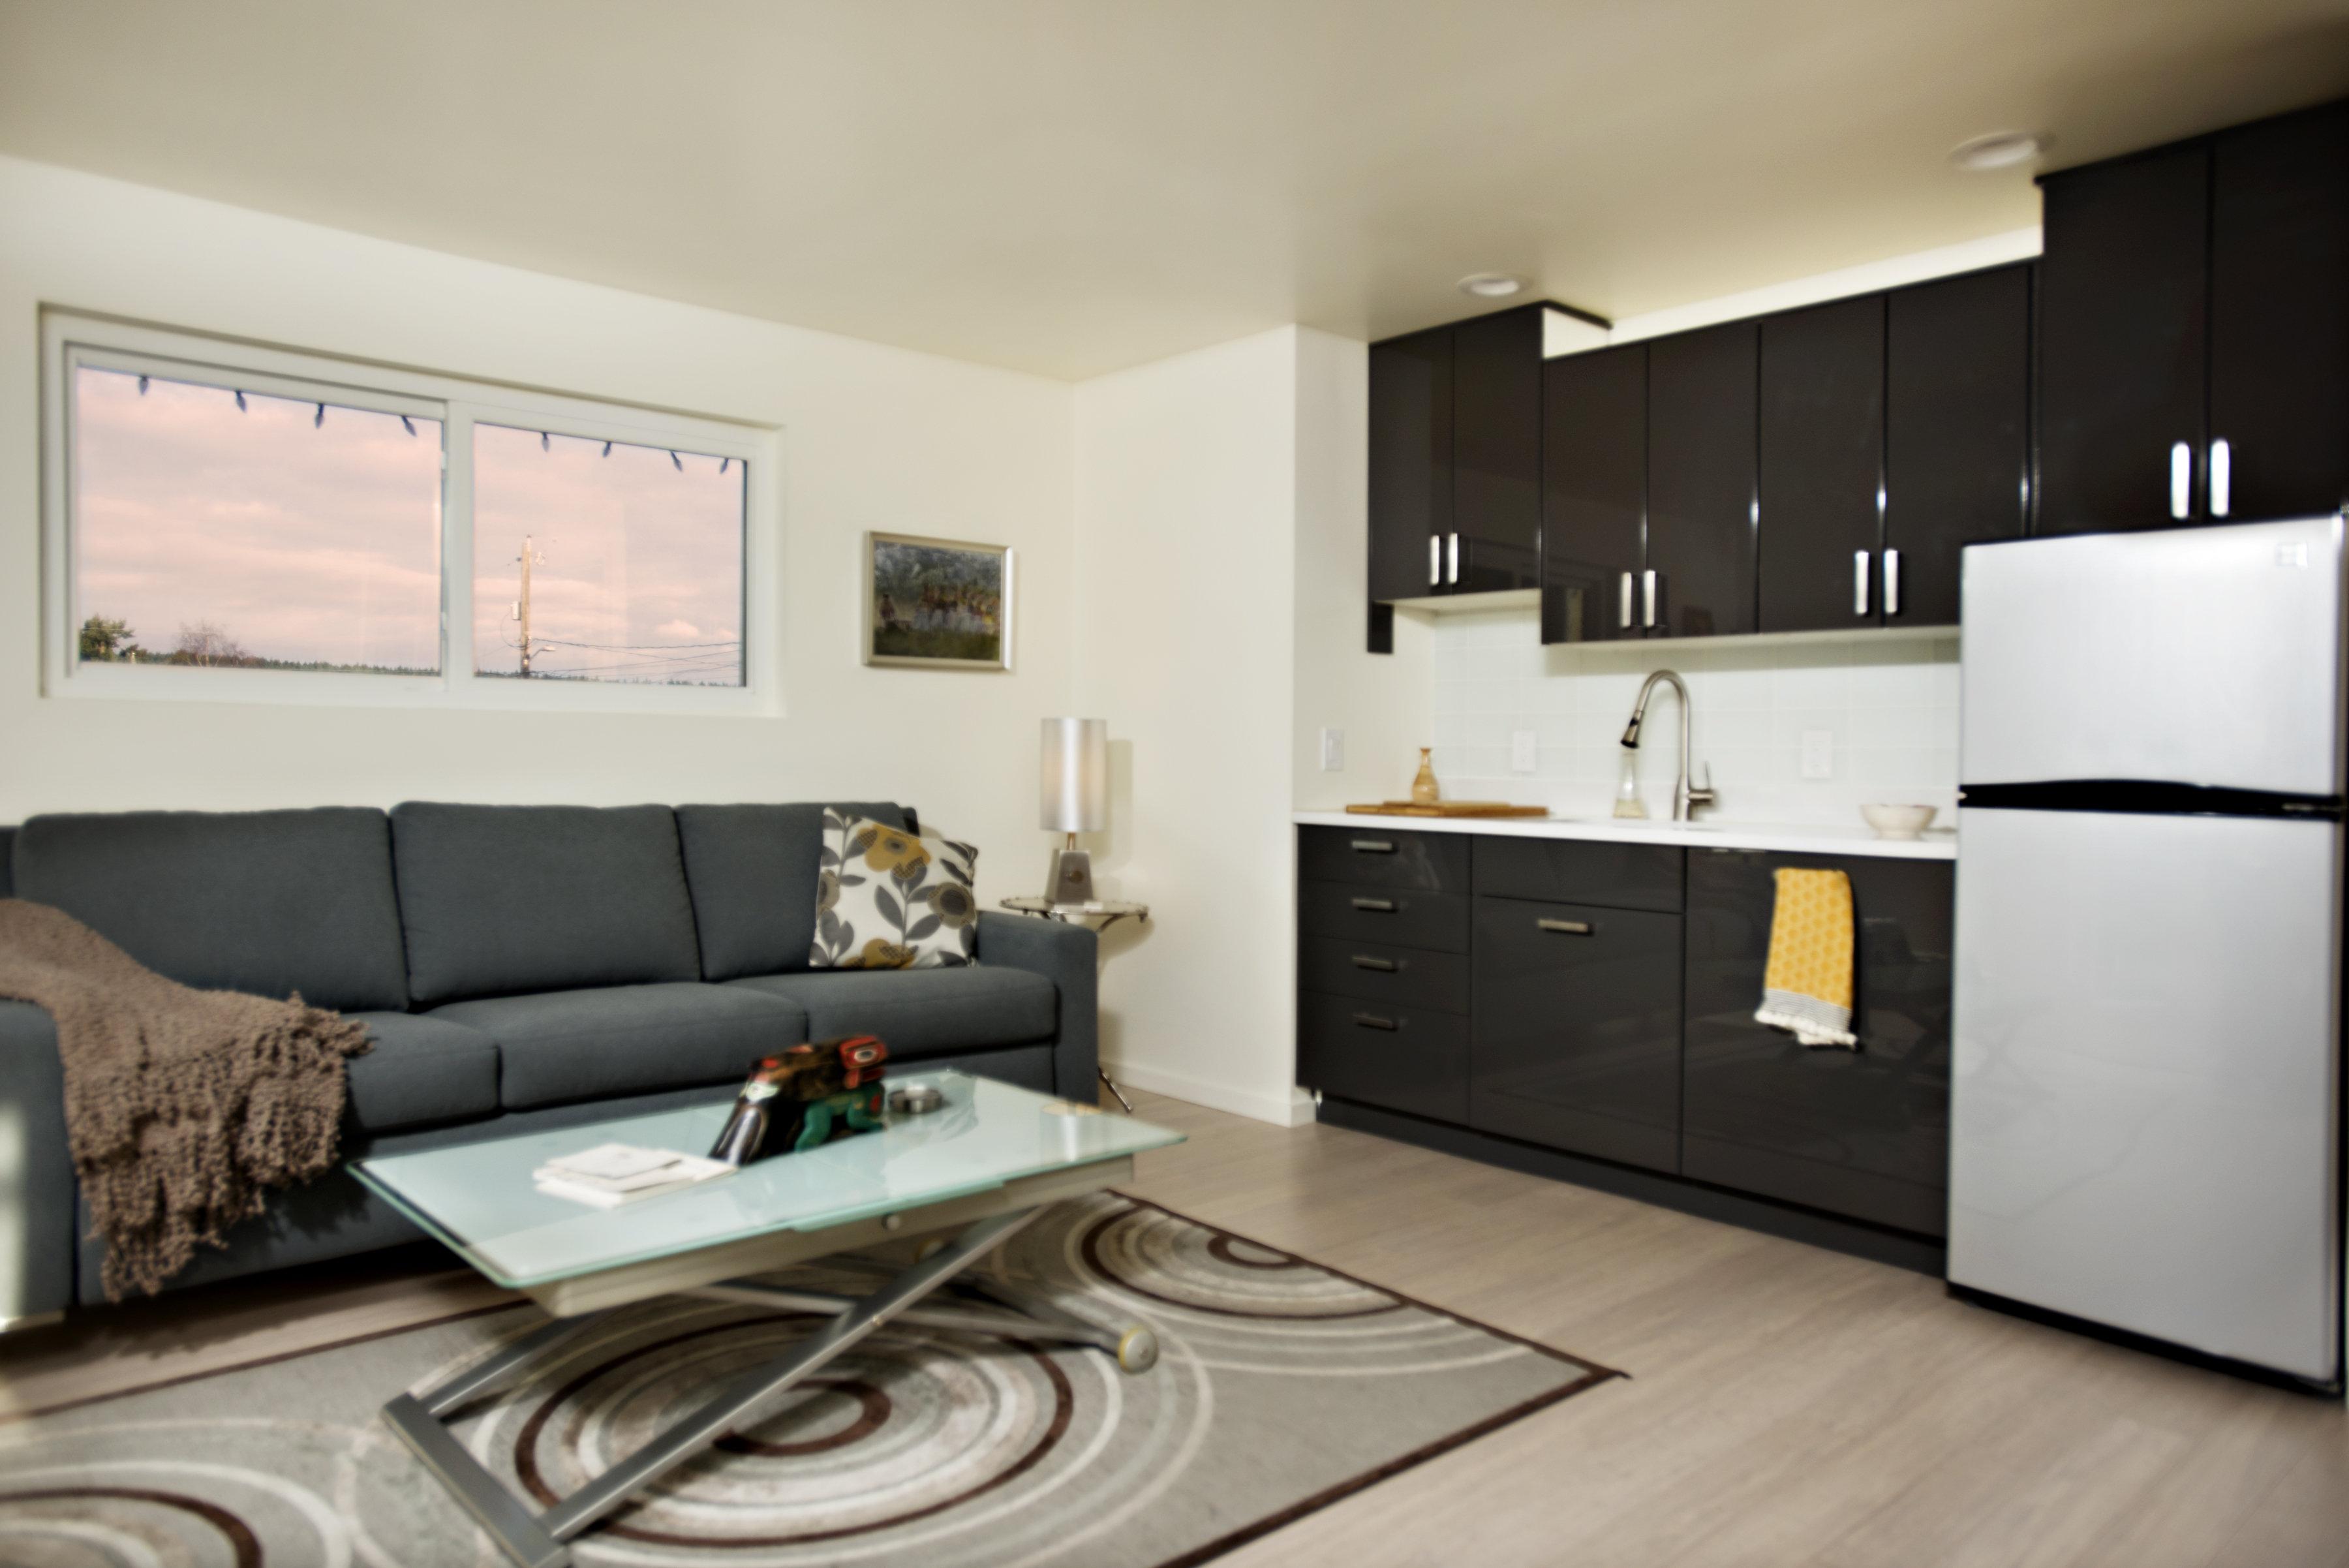 Rooms Benton Street Retreat La Conner Lodging